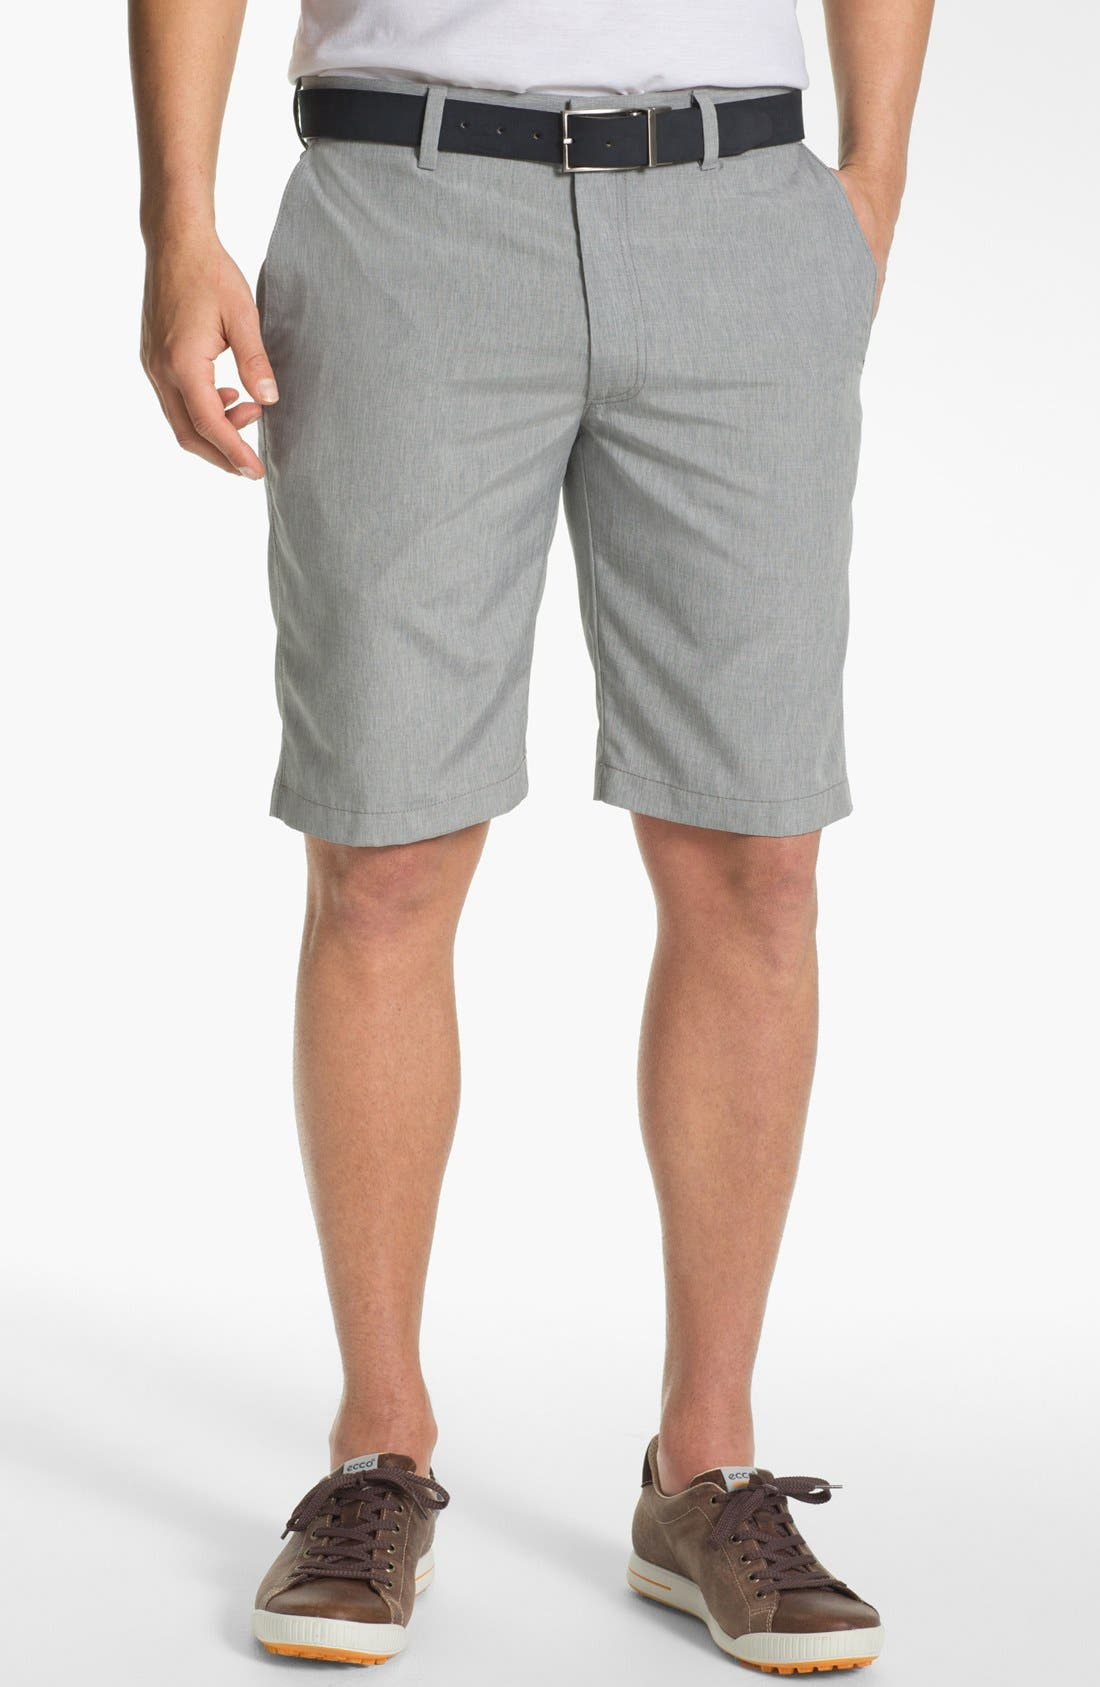 Alternate Image 1 Selected - Callaway Golf® 'Tech' Shorts